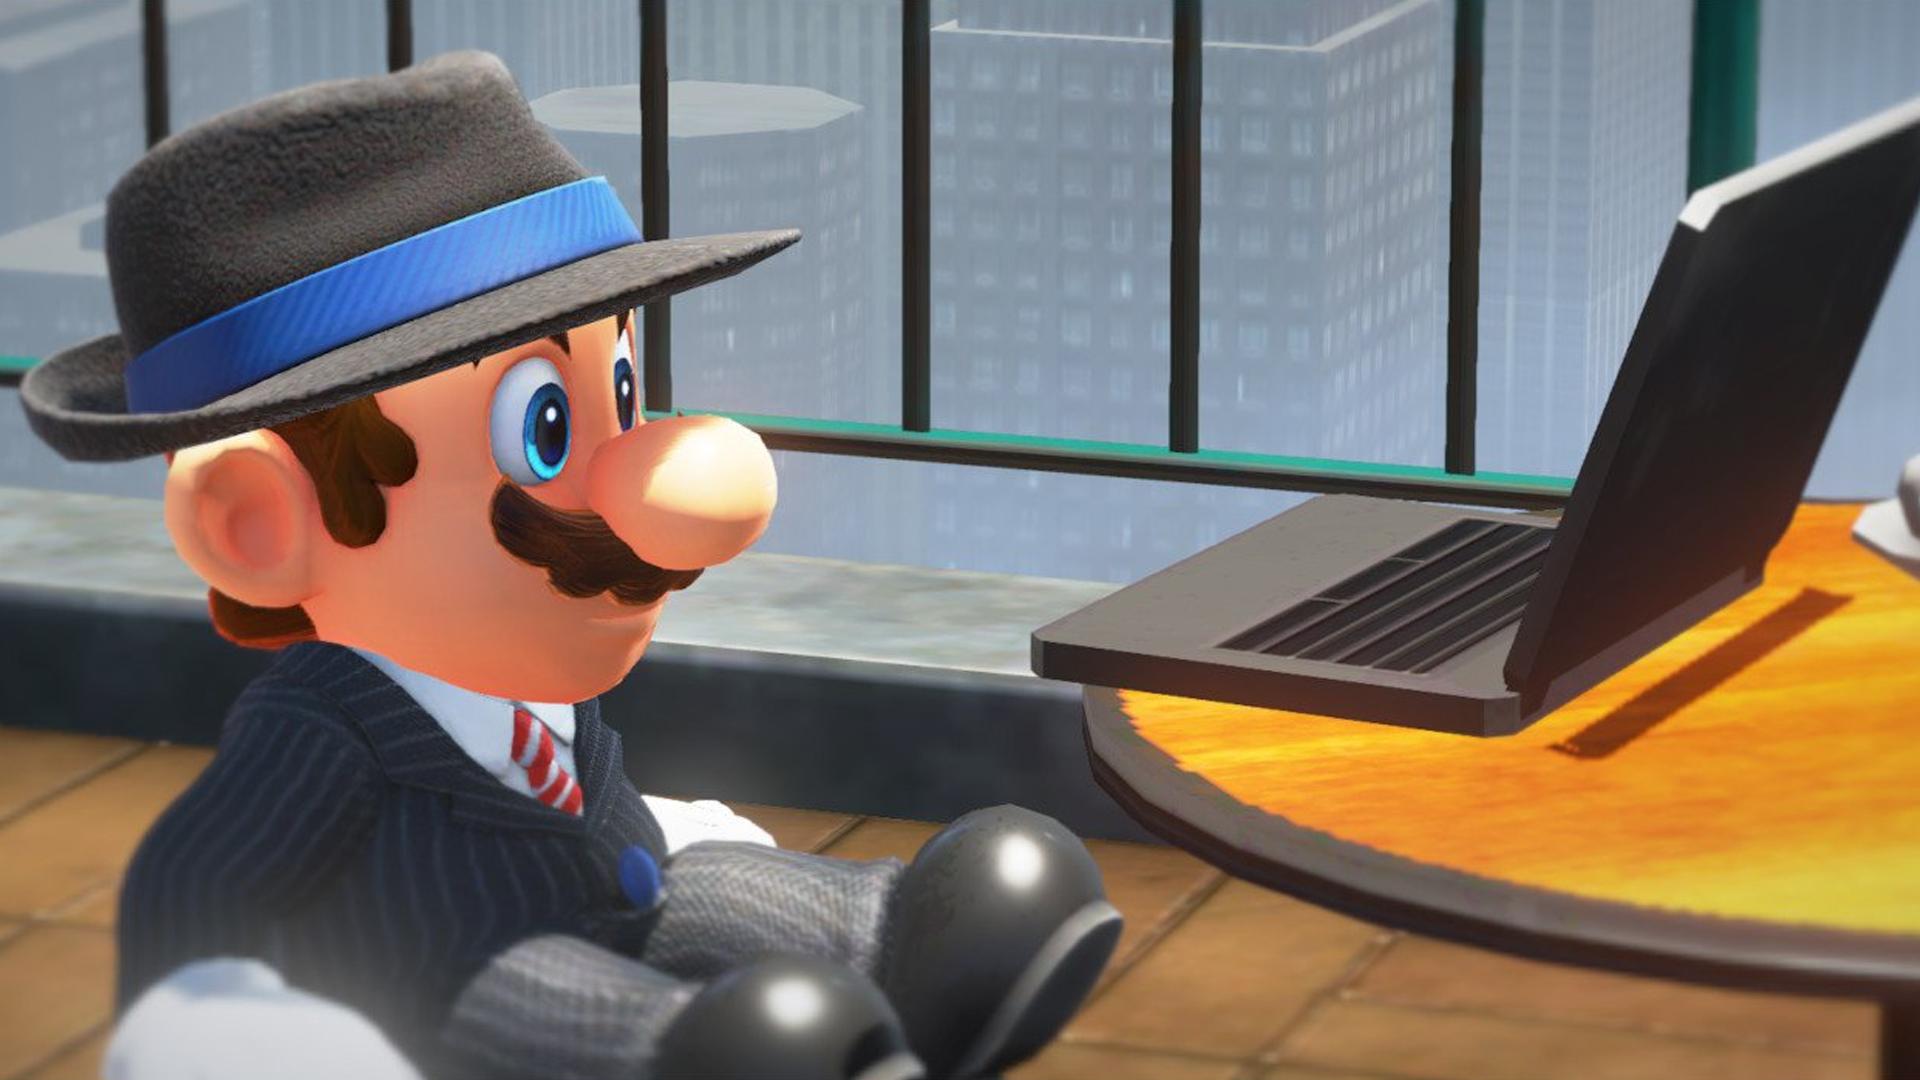 Mario's also an unpaid content generator.